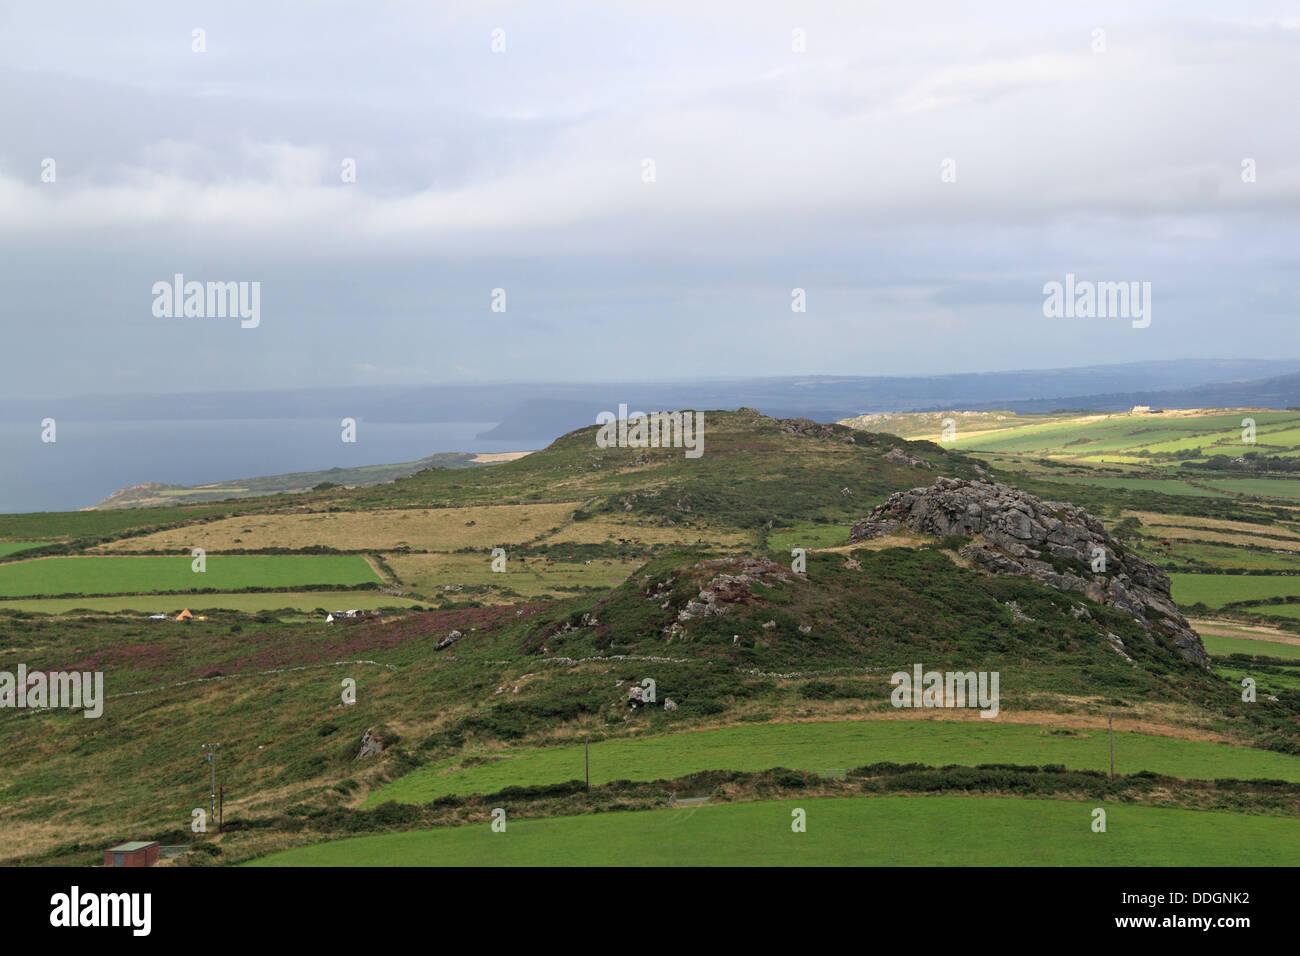 Garn Fechan Iron Age Hillfort from Garn Fawr, Pen Caer peninsula, Pembrokeshire, Wales, Great Britain, United Kingdom - Stock Image